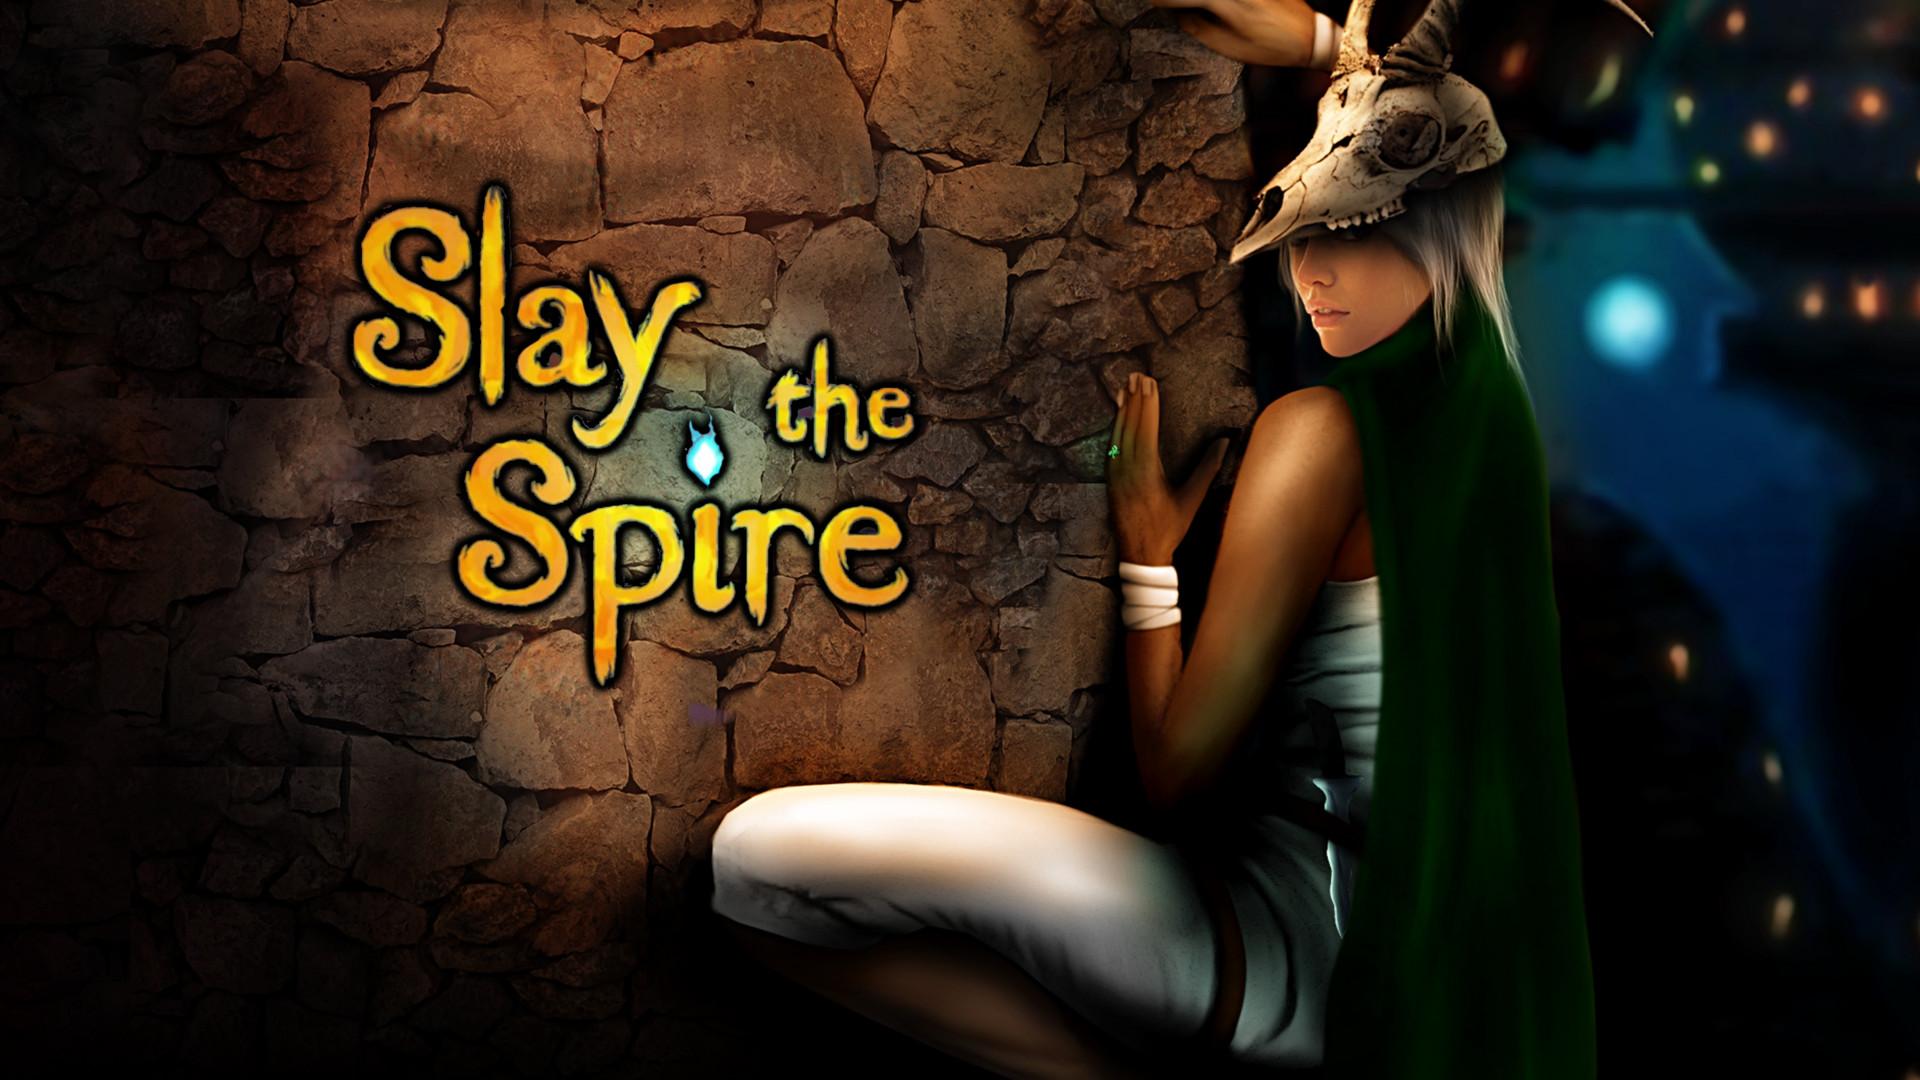 Lysander Xonora The Silent Slay The Spire Wallpaper